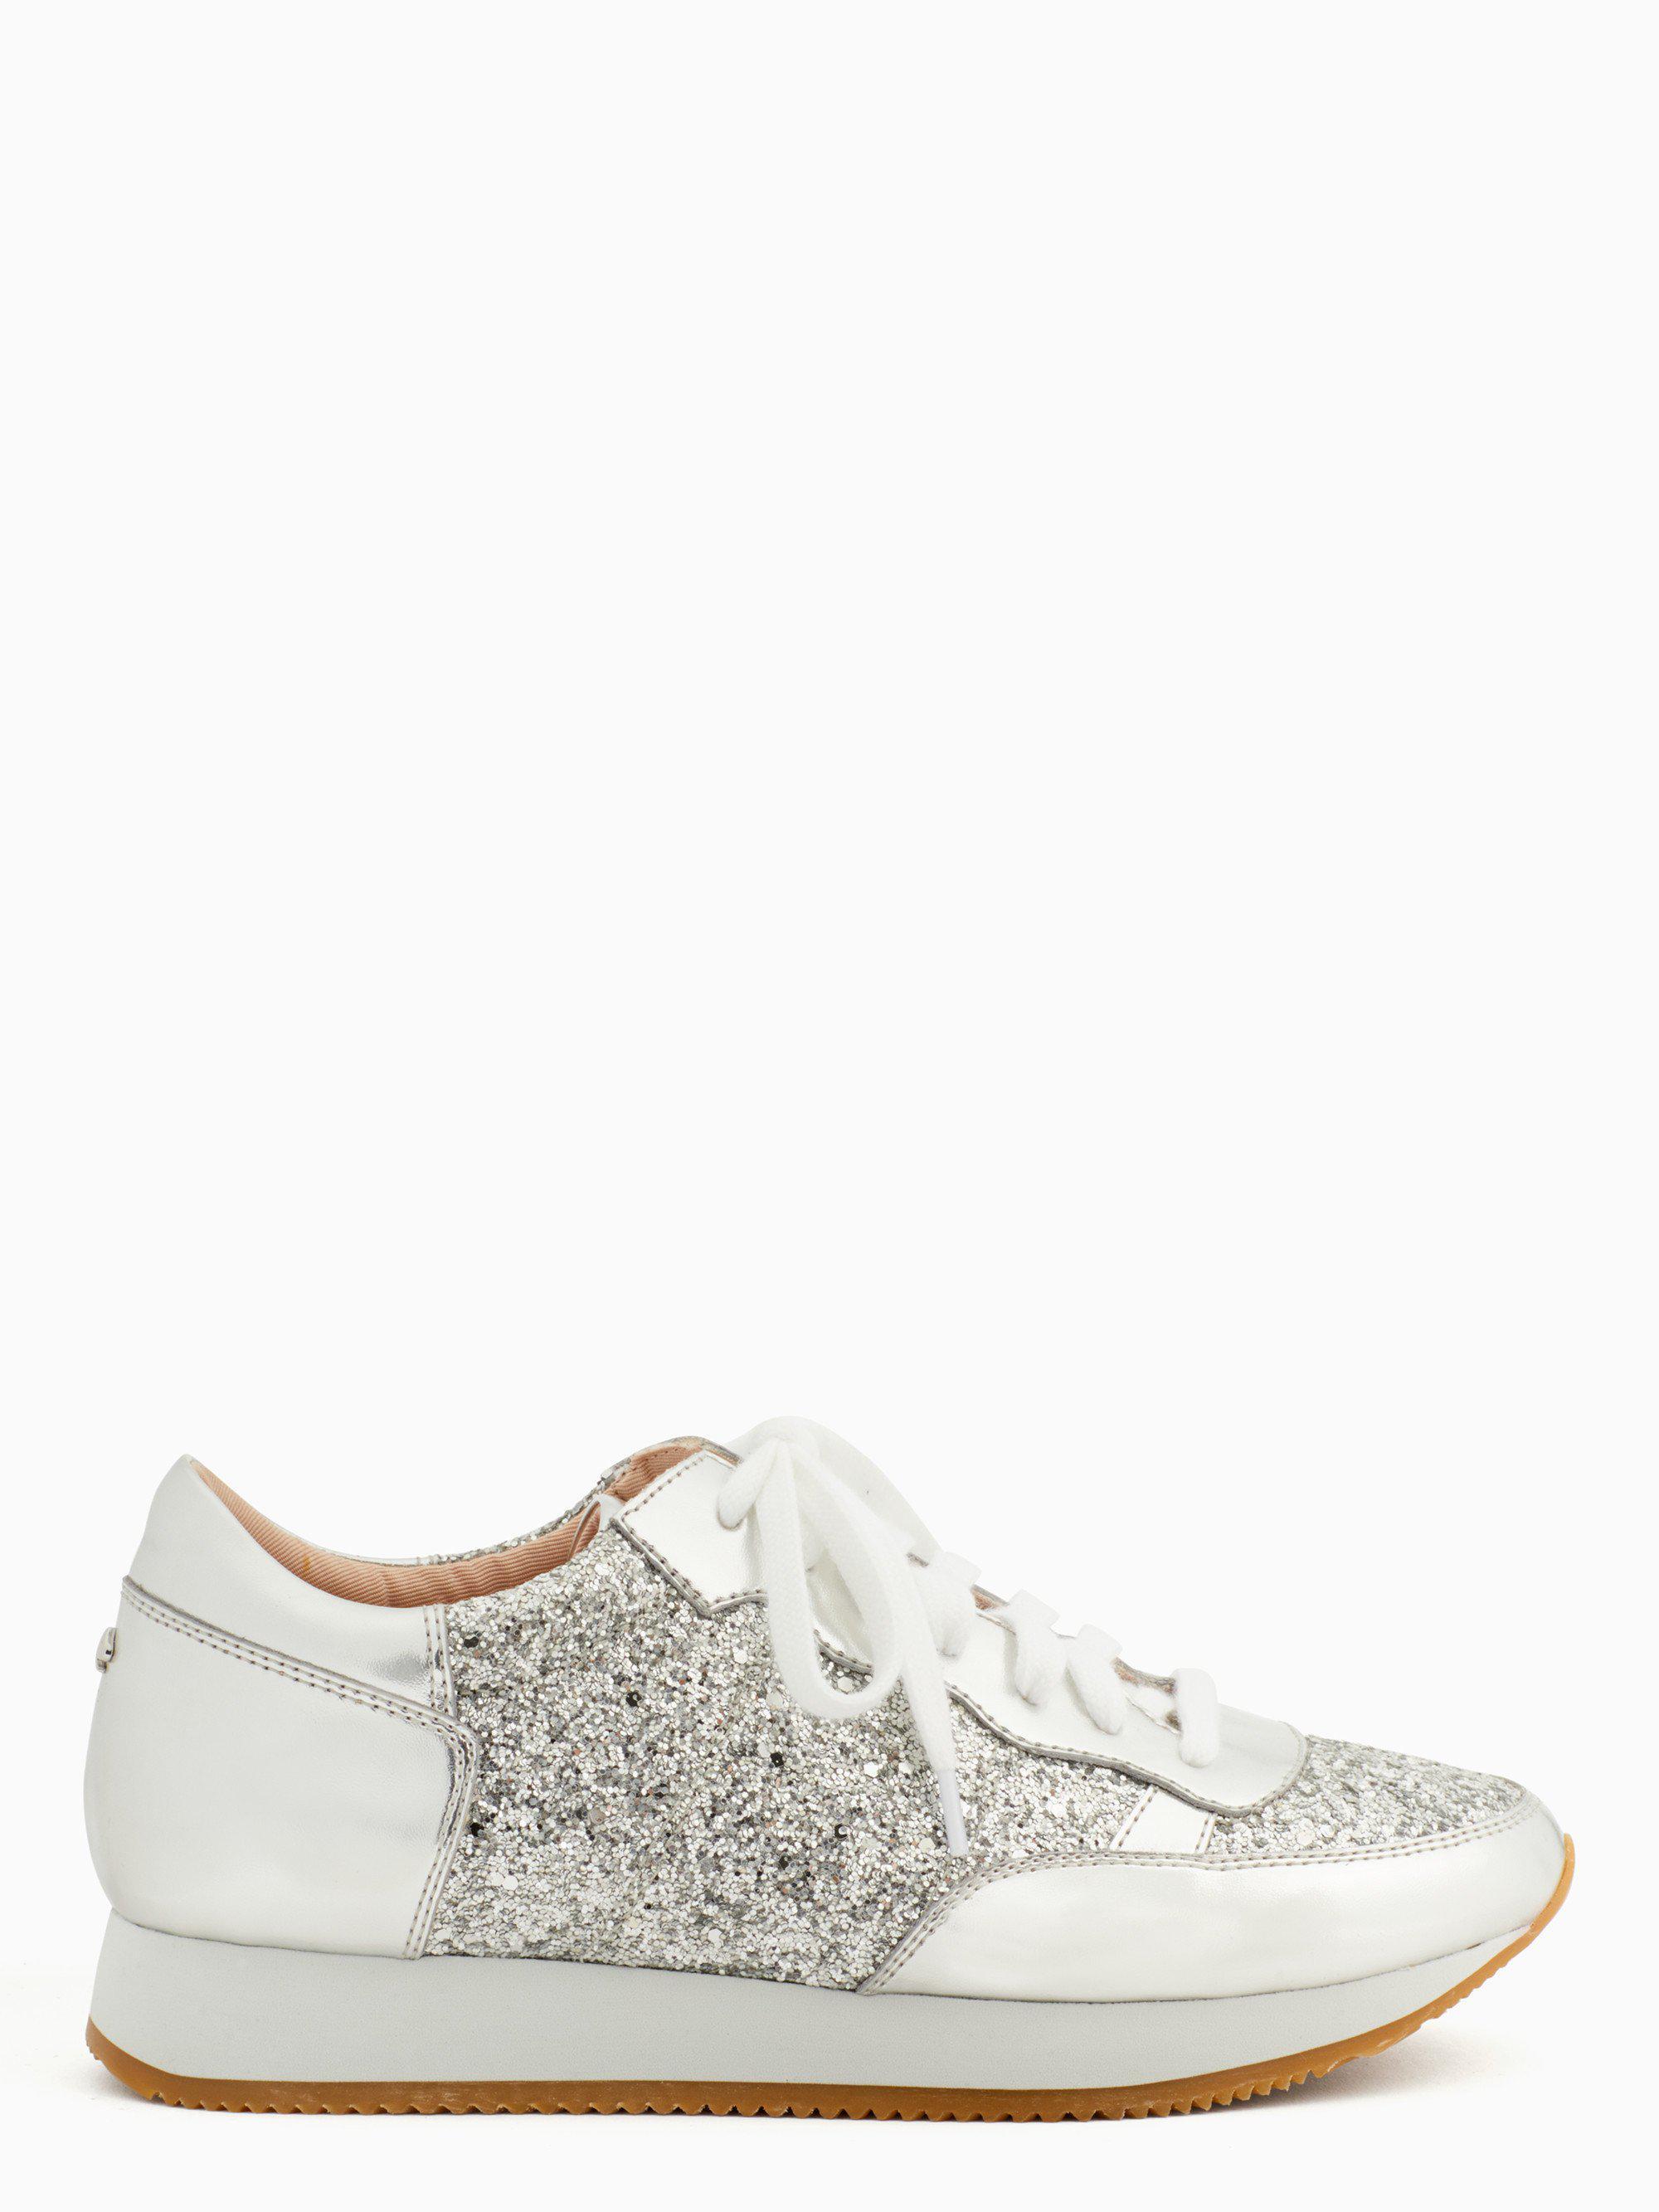 8a8e02f6e16c Kate Spade Felicia Sneakers - Lyst